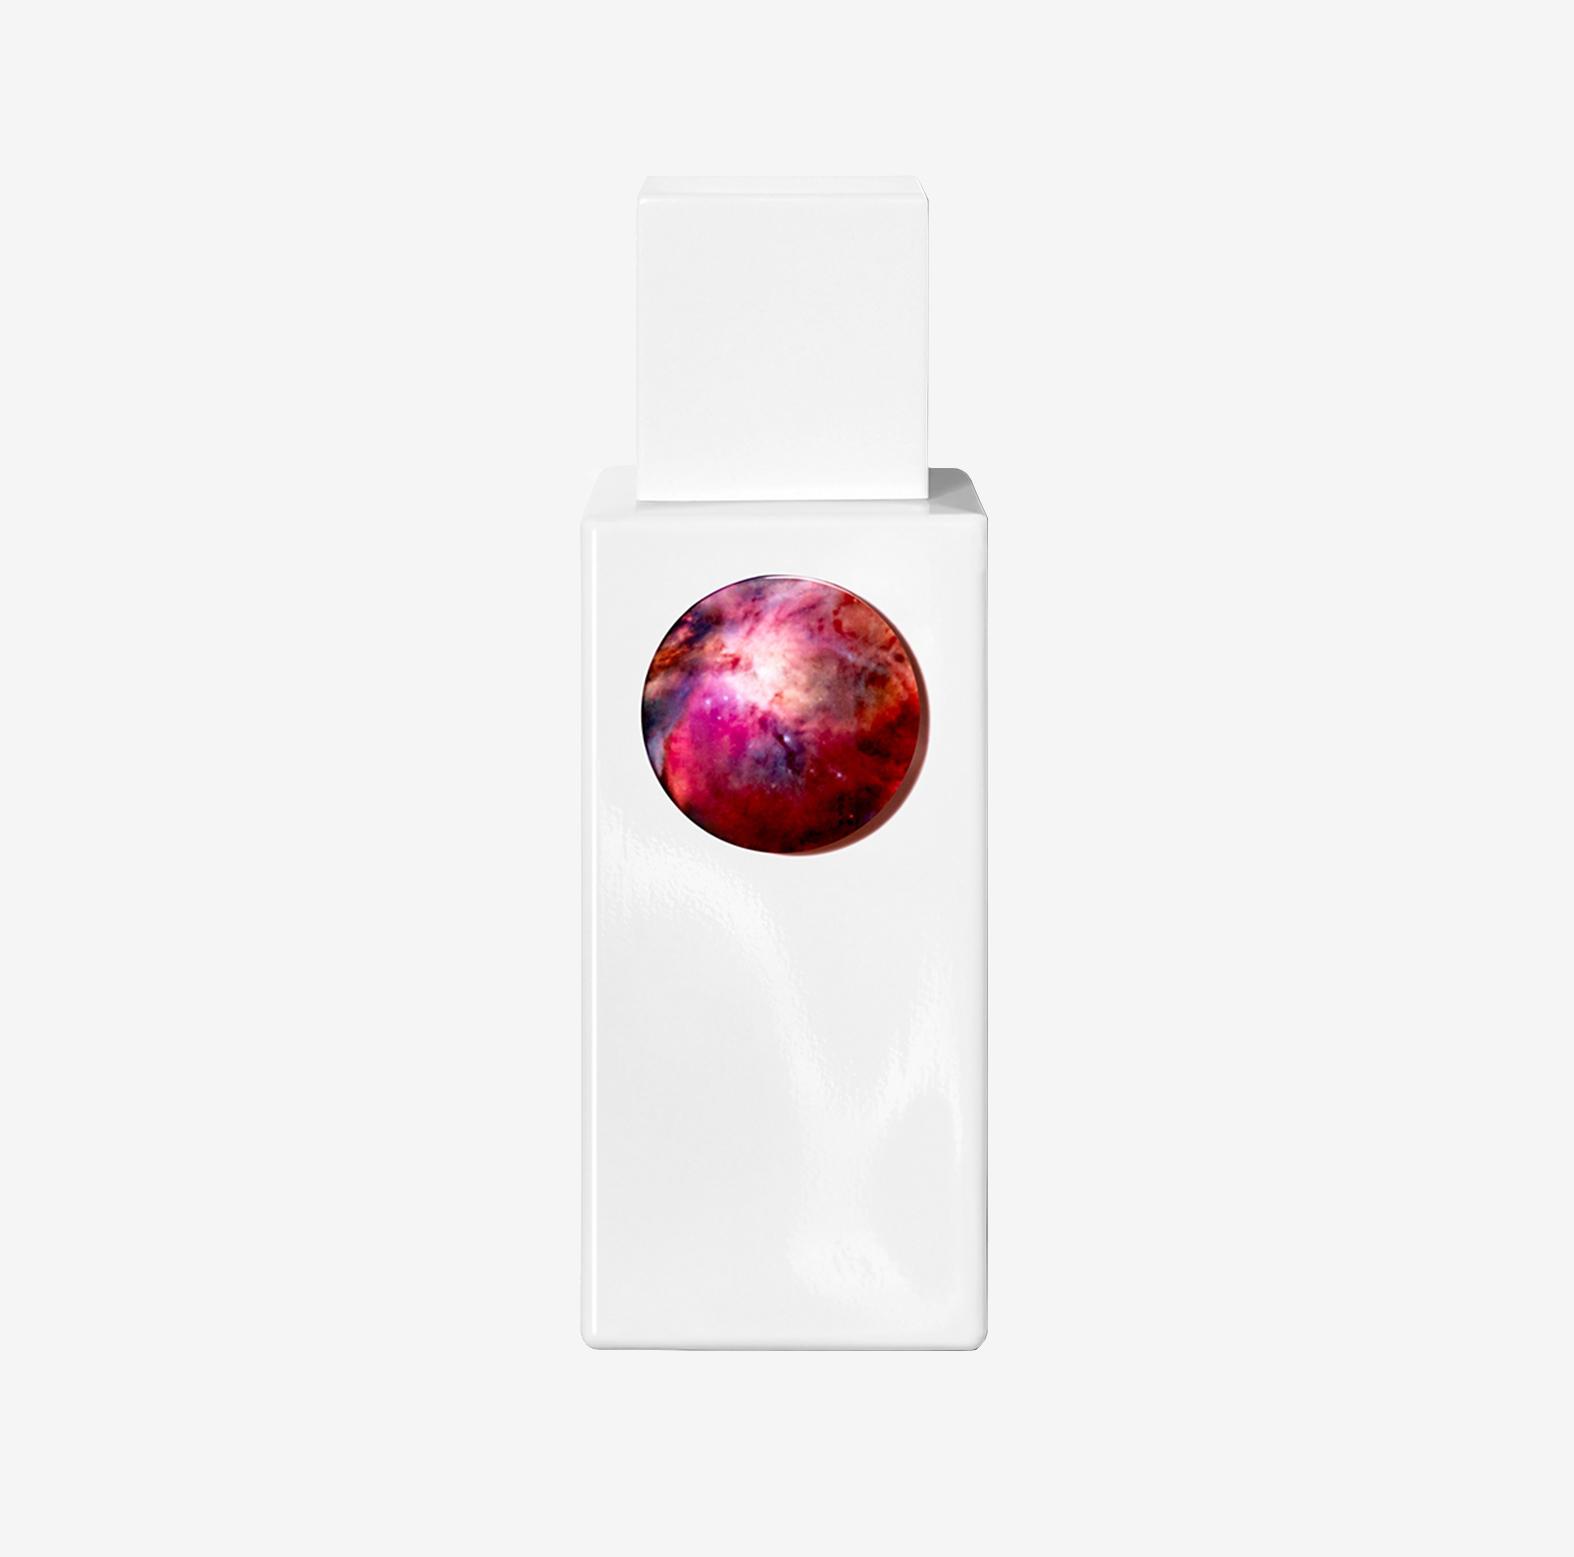 NEBULA 1: ORION, OLIVER & CO